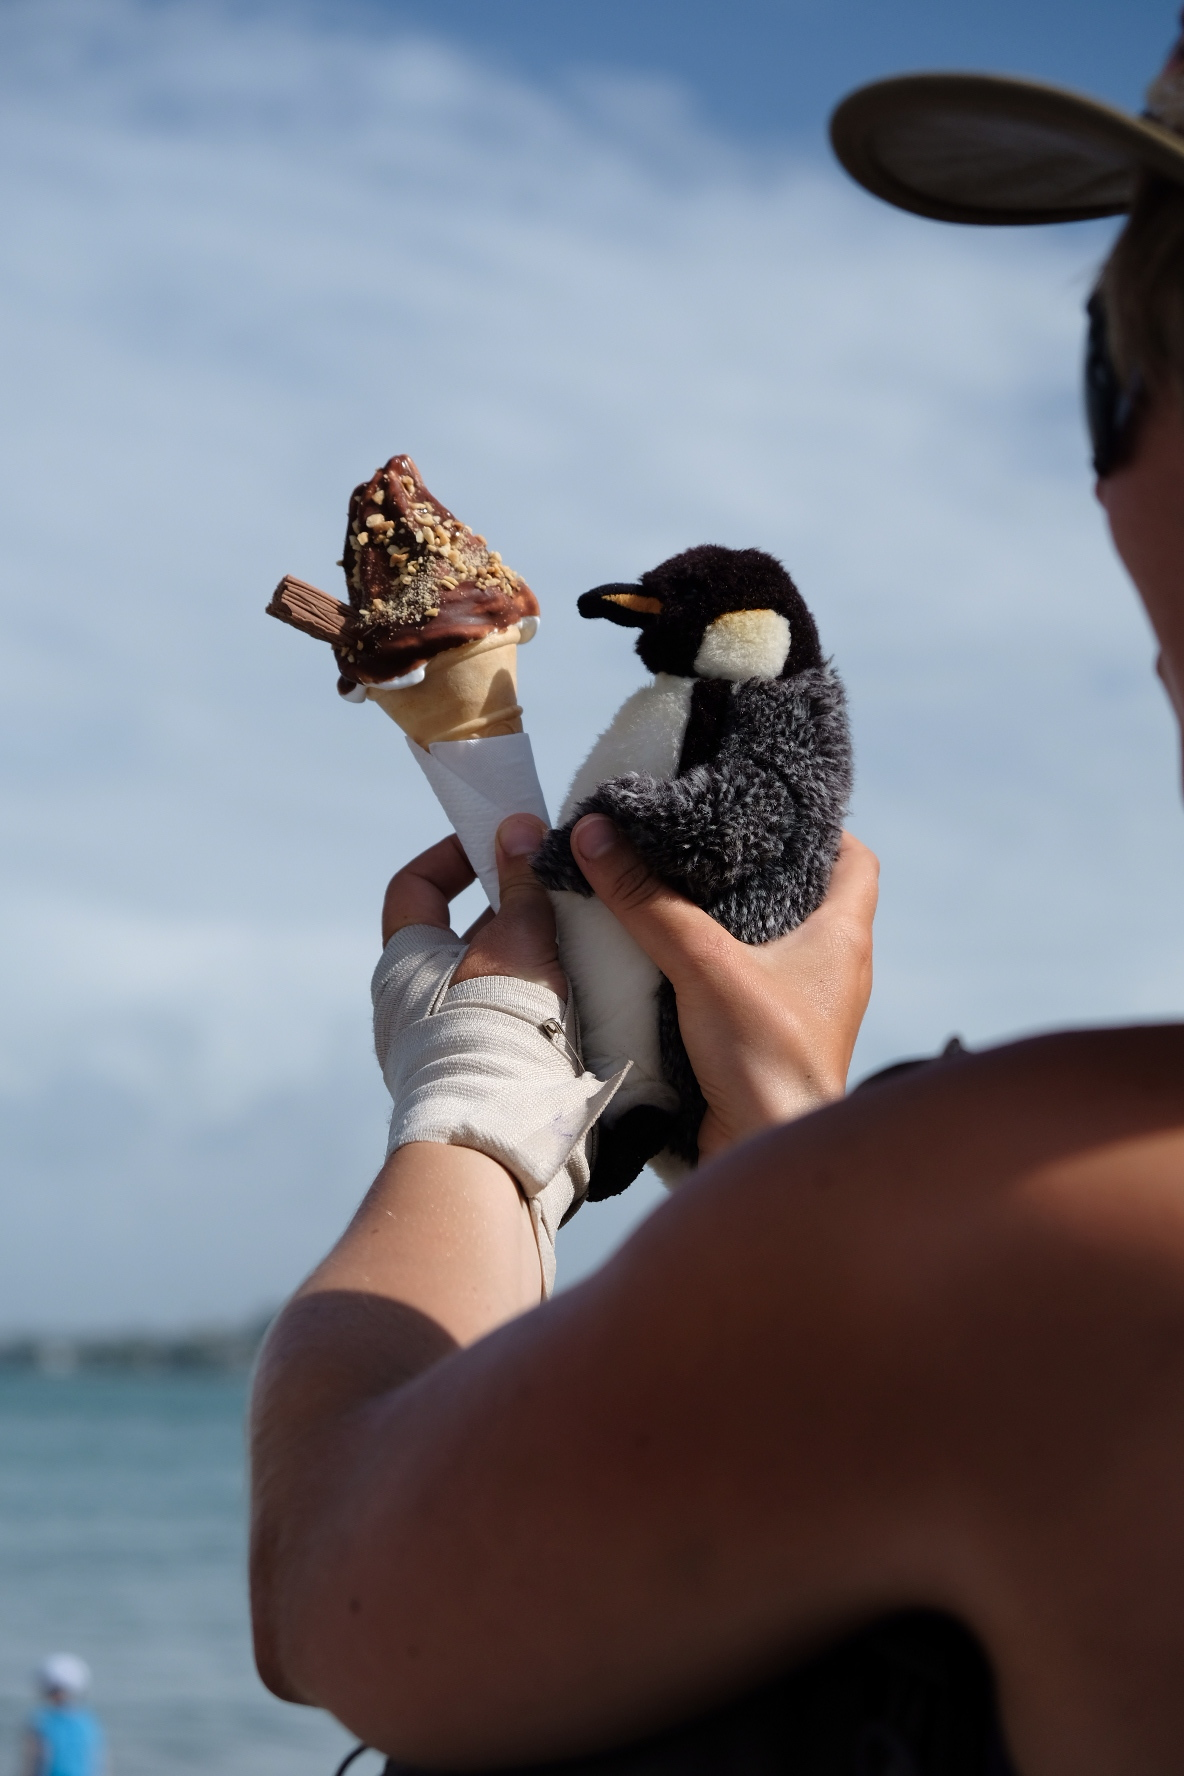 Philip enjoying a well earned ice cream